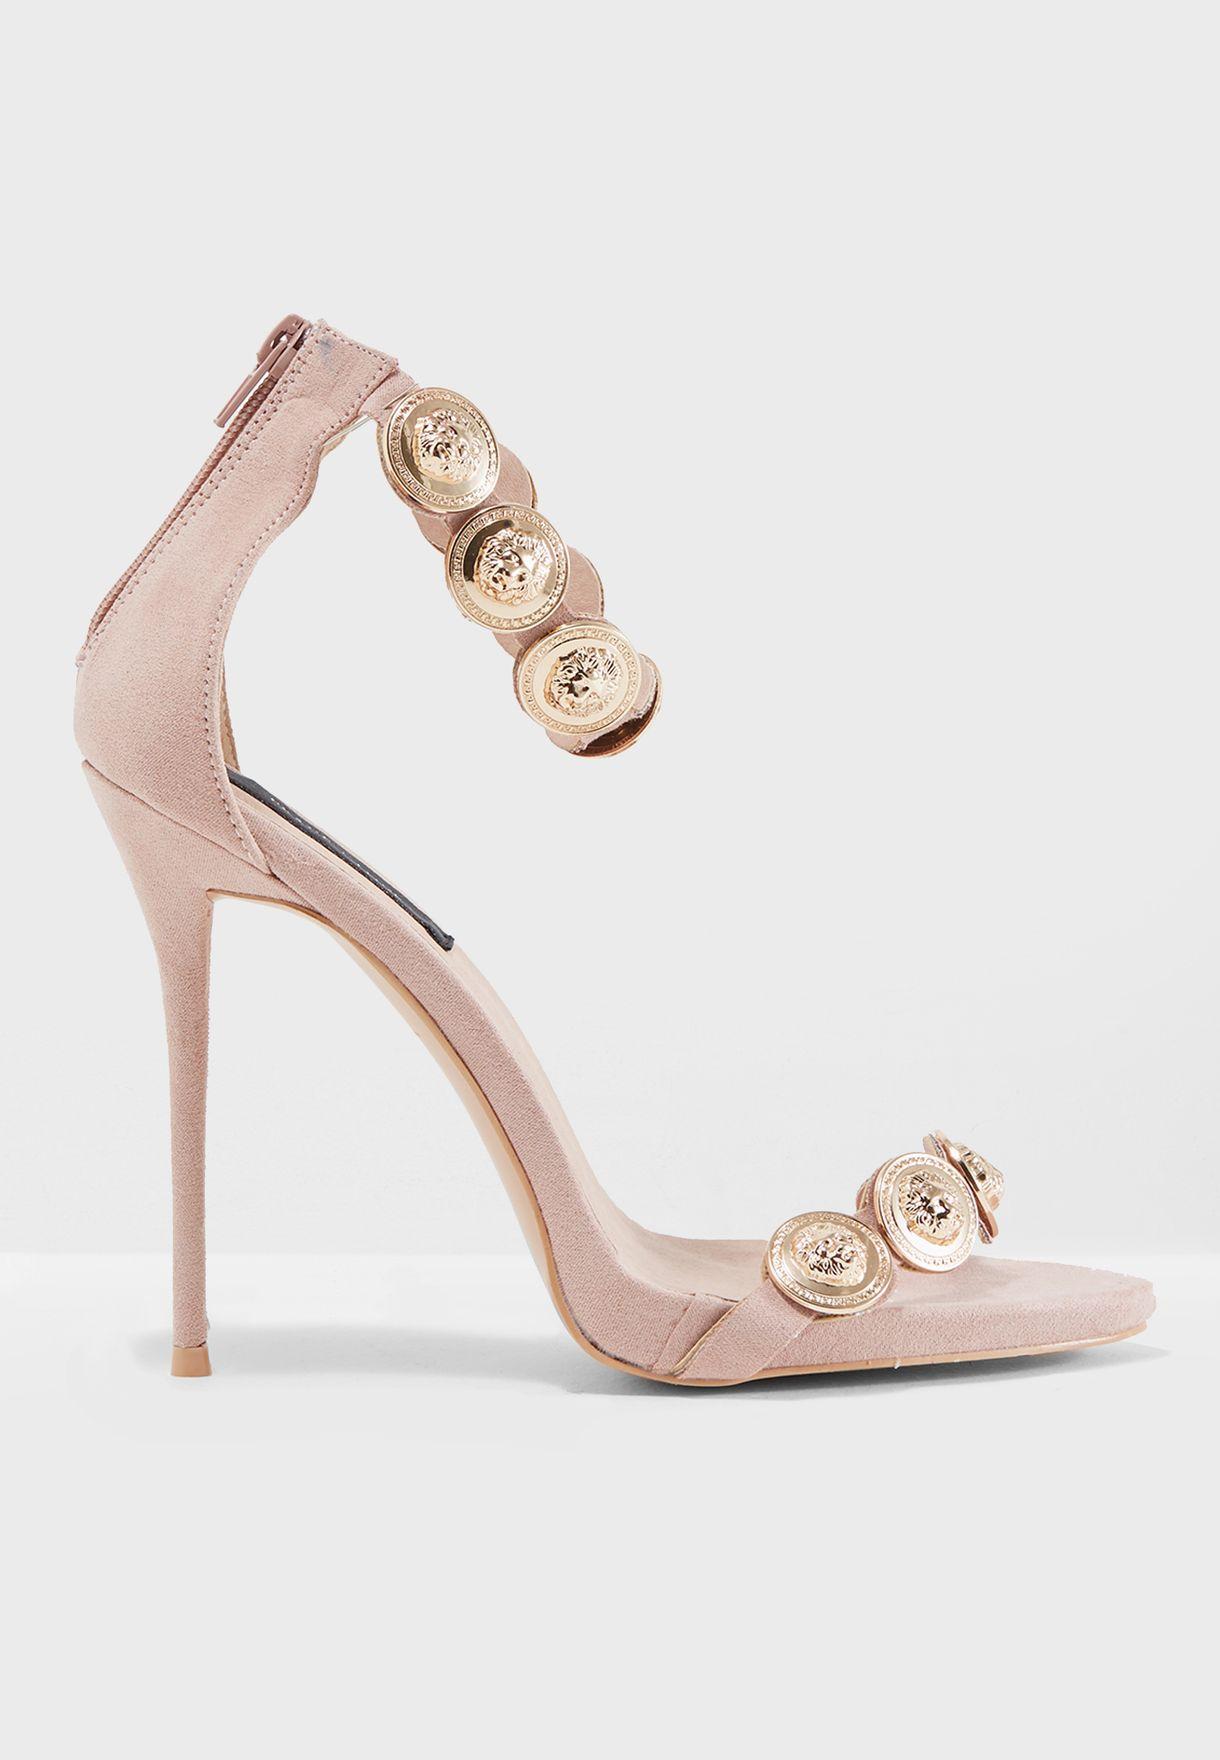 5f3c0a998404 Shop Missguided pink Peace + Love Black Embellished Strap Heeled ...